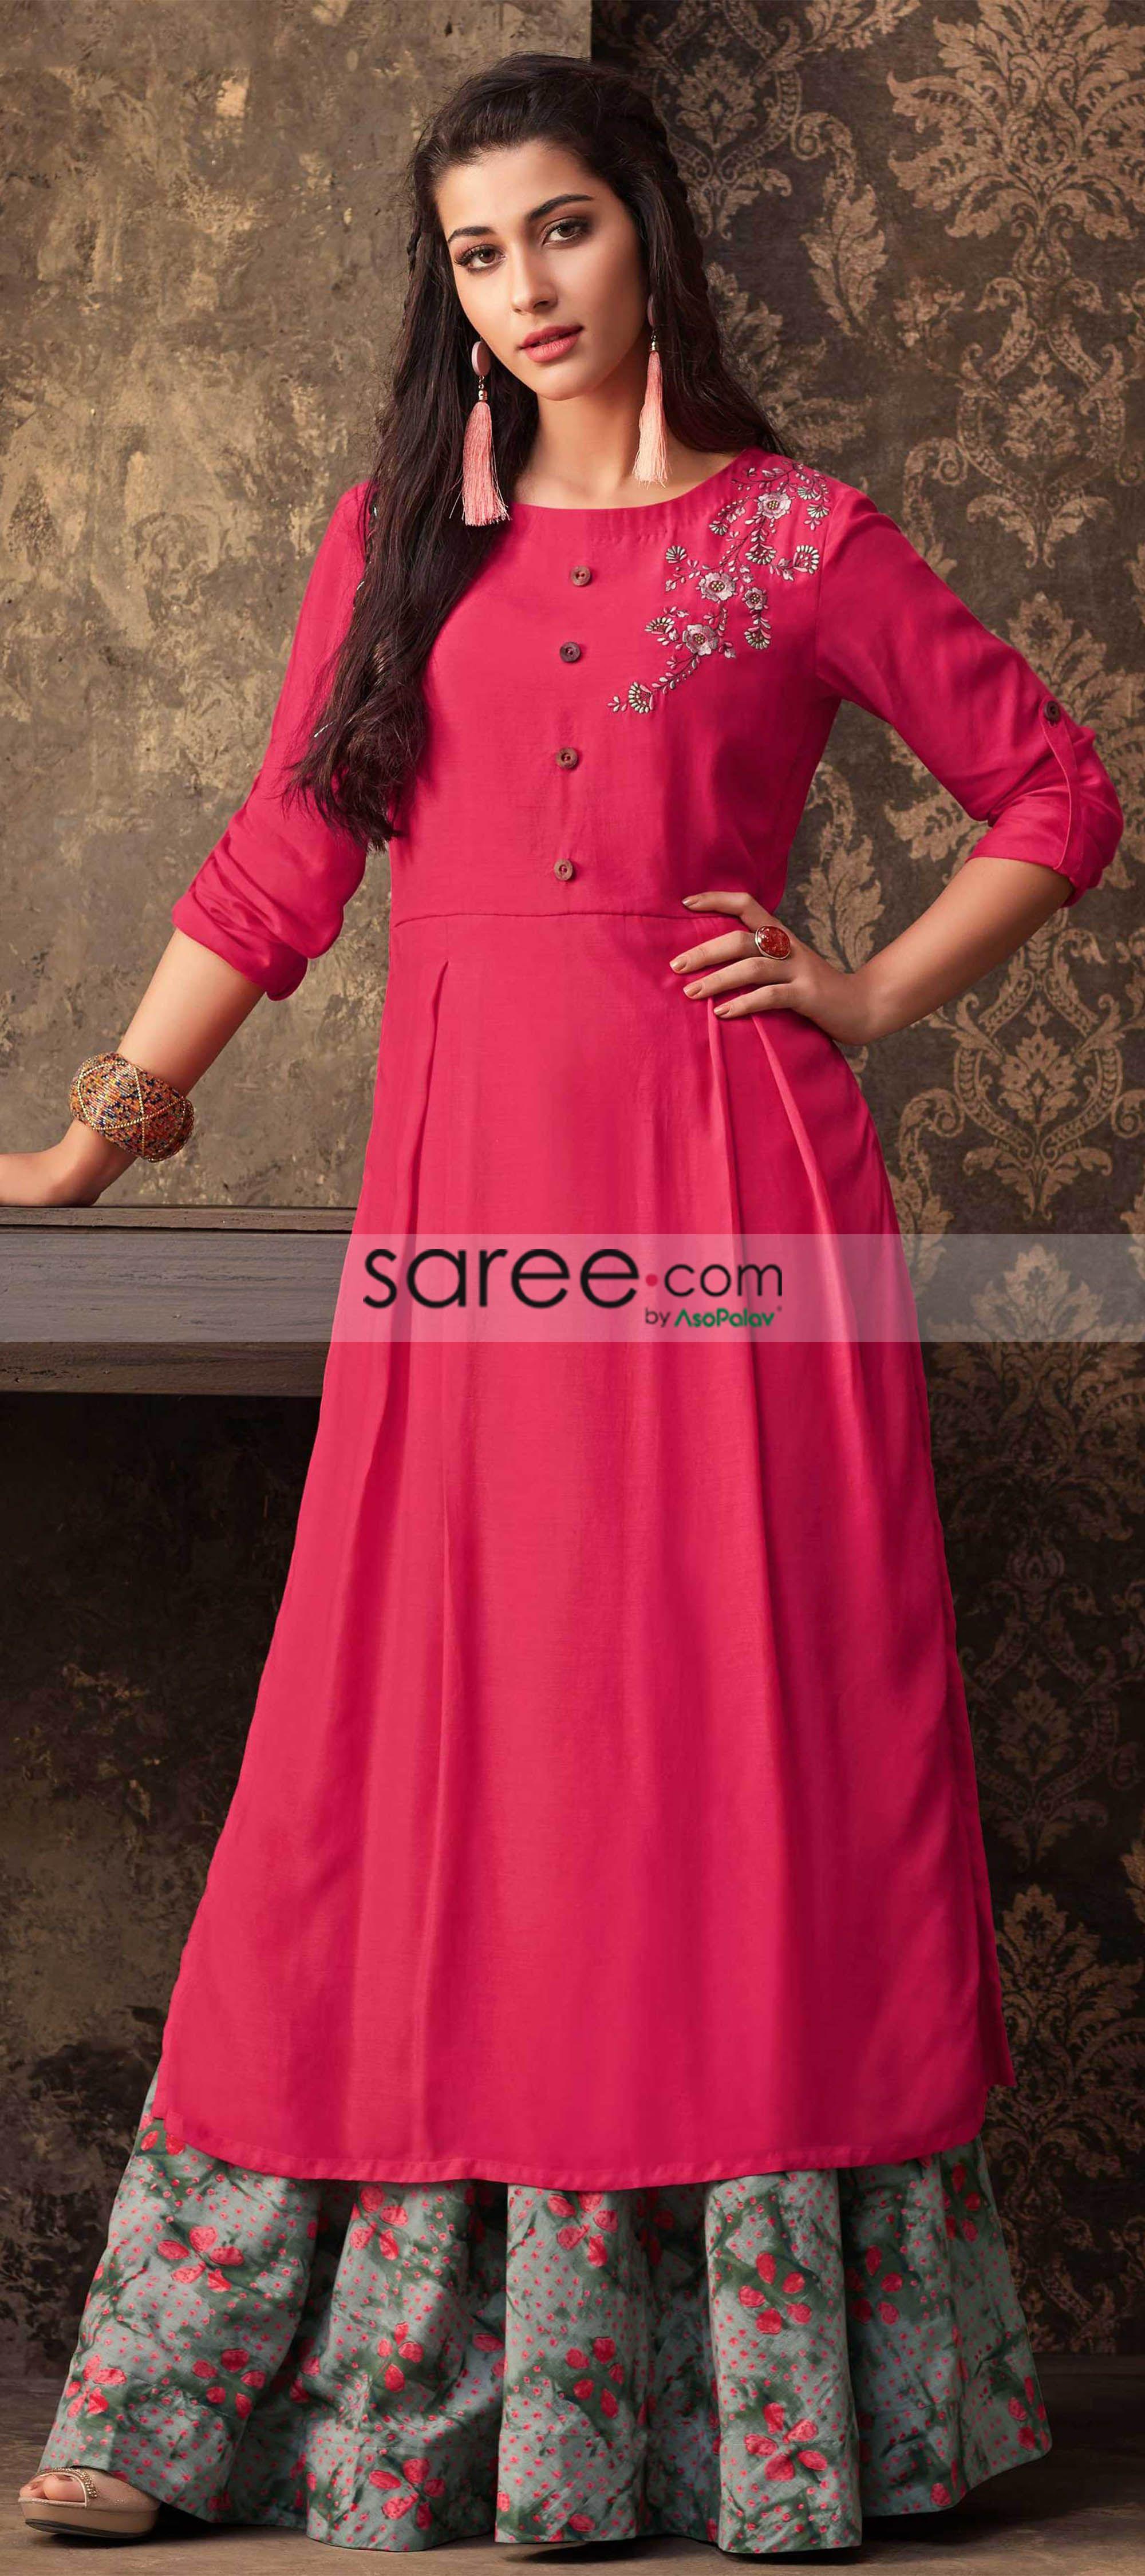 0a4f2717301d4 Dark Pink Muslin Cotton Kurti With Printed Skirt